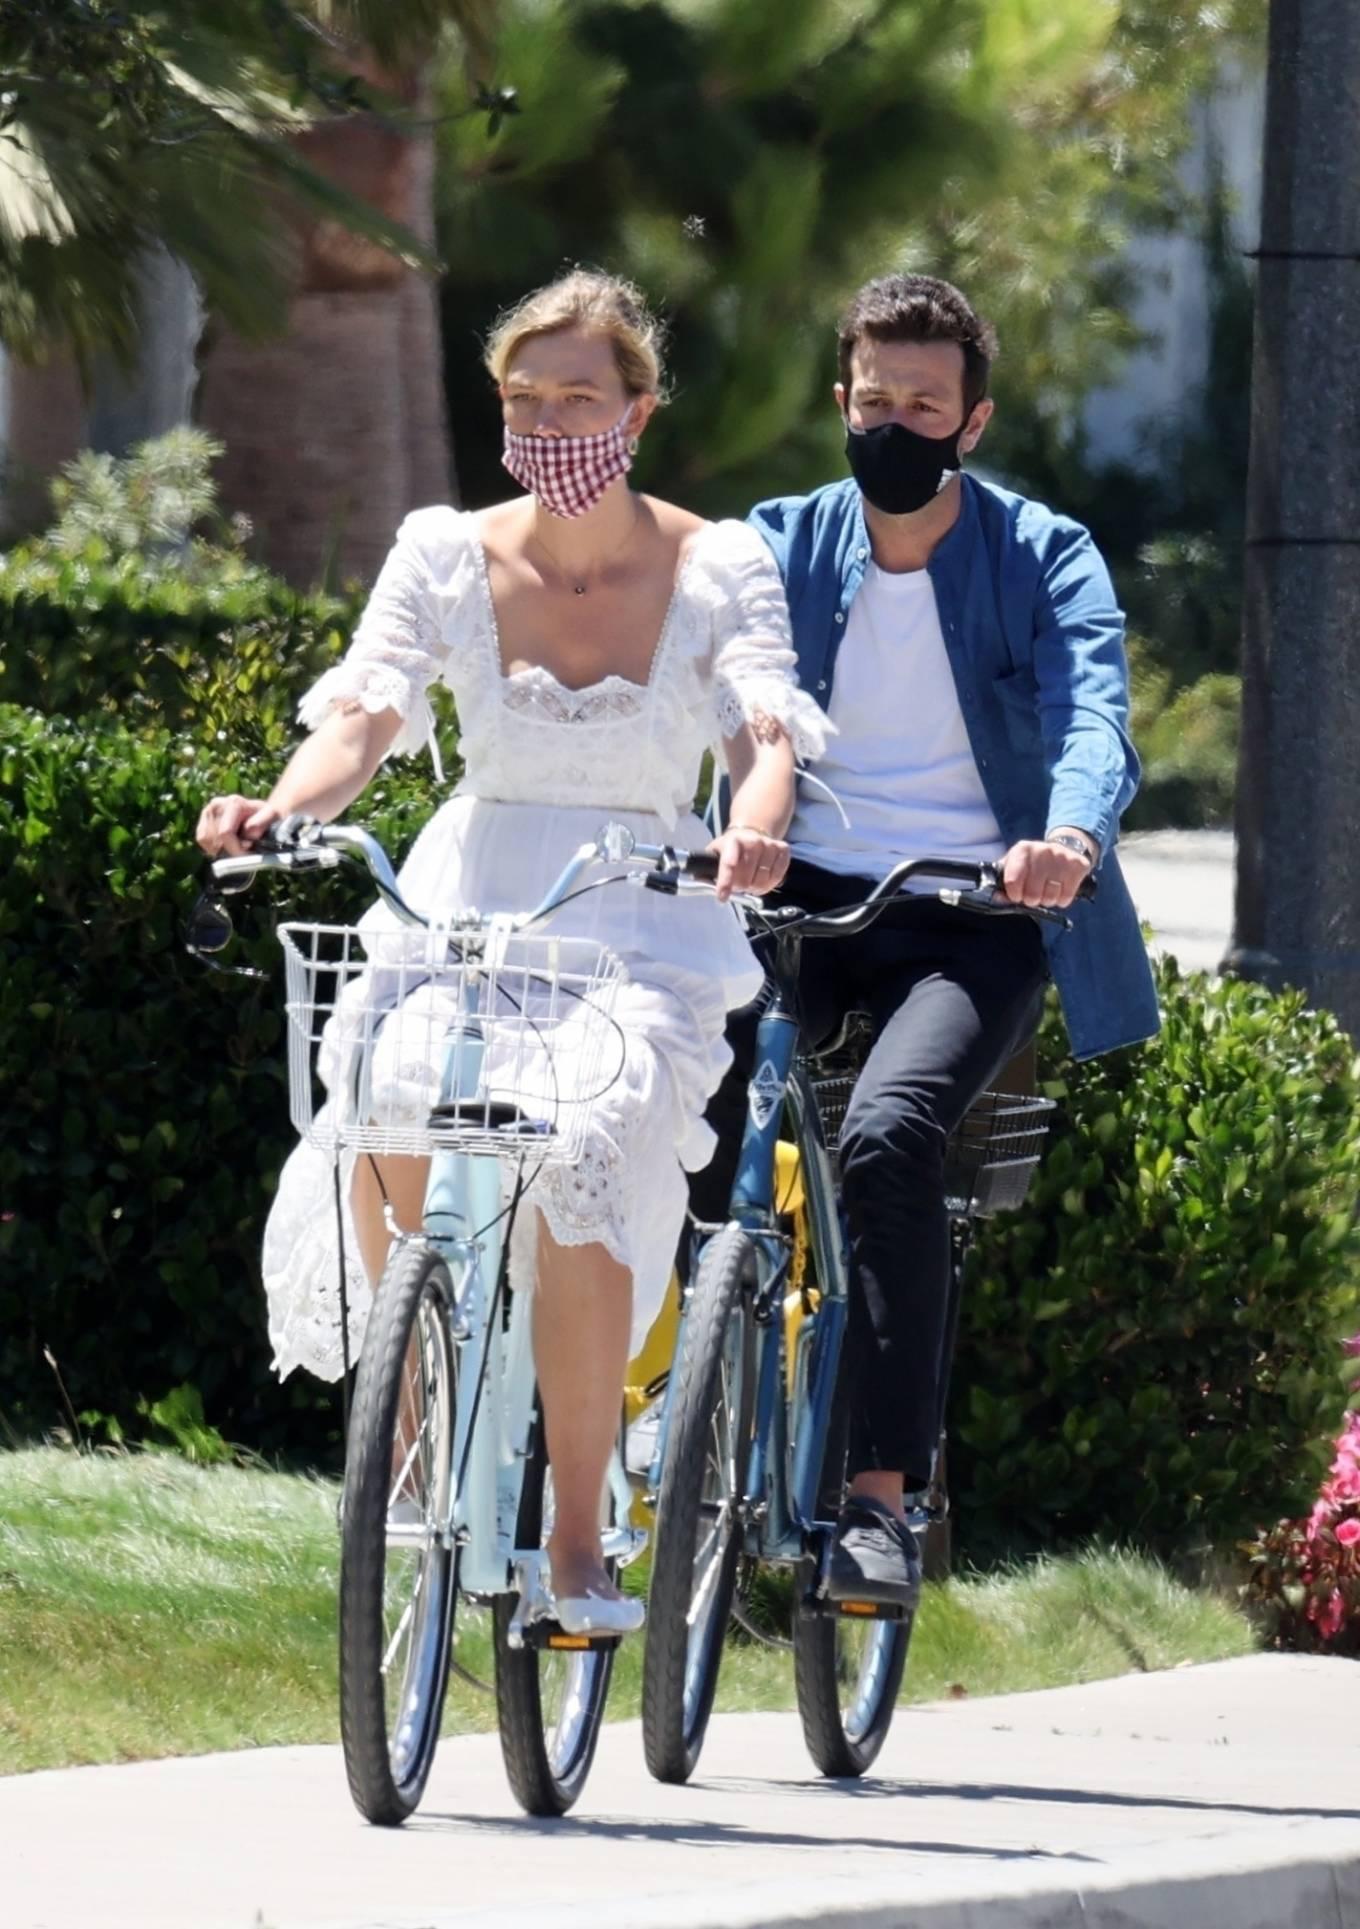 Karlie Kloss - Bike ride with her fiance in Santa Monica